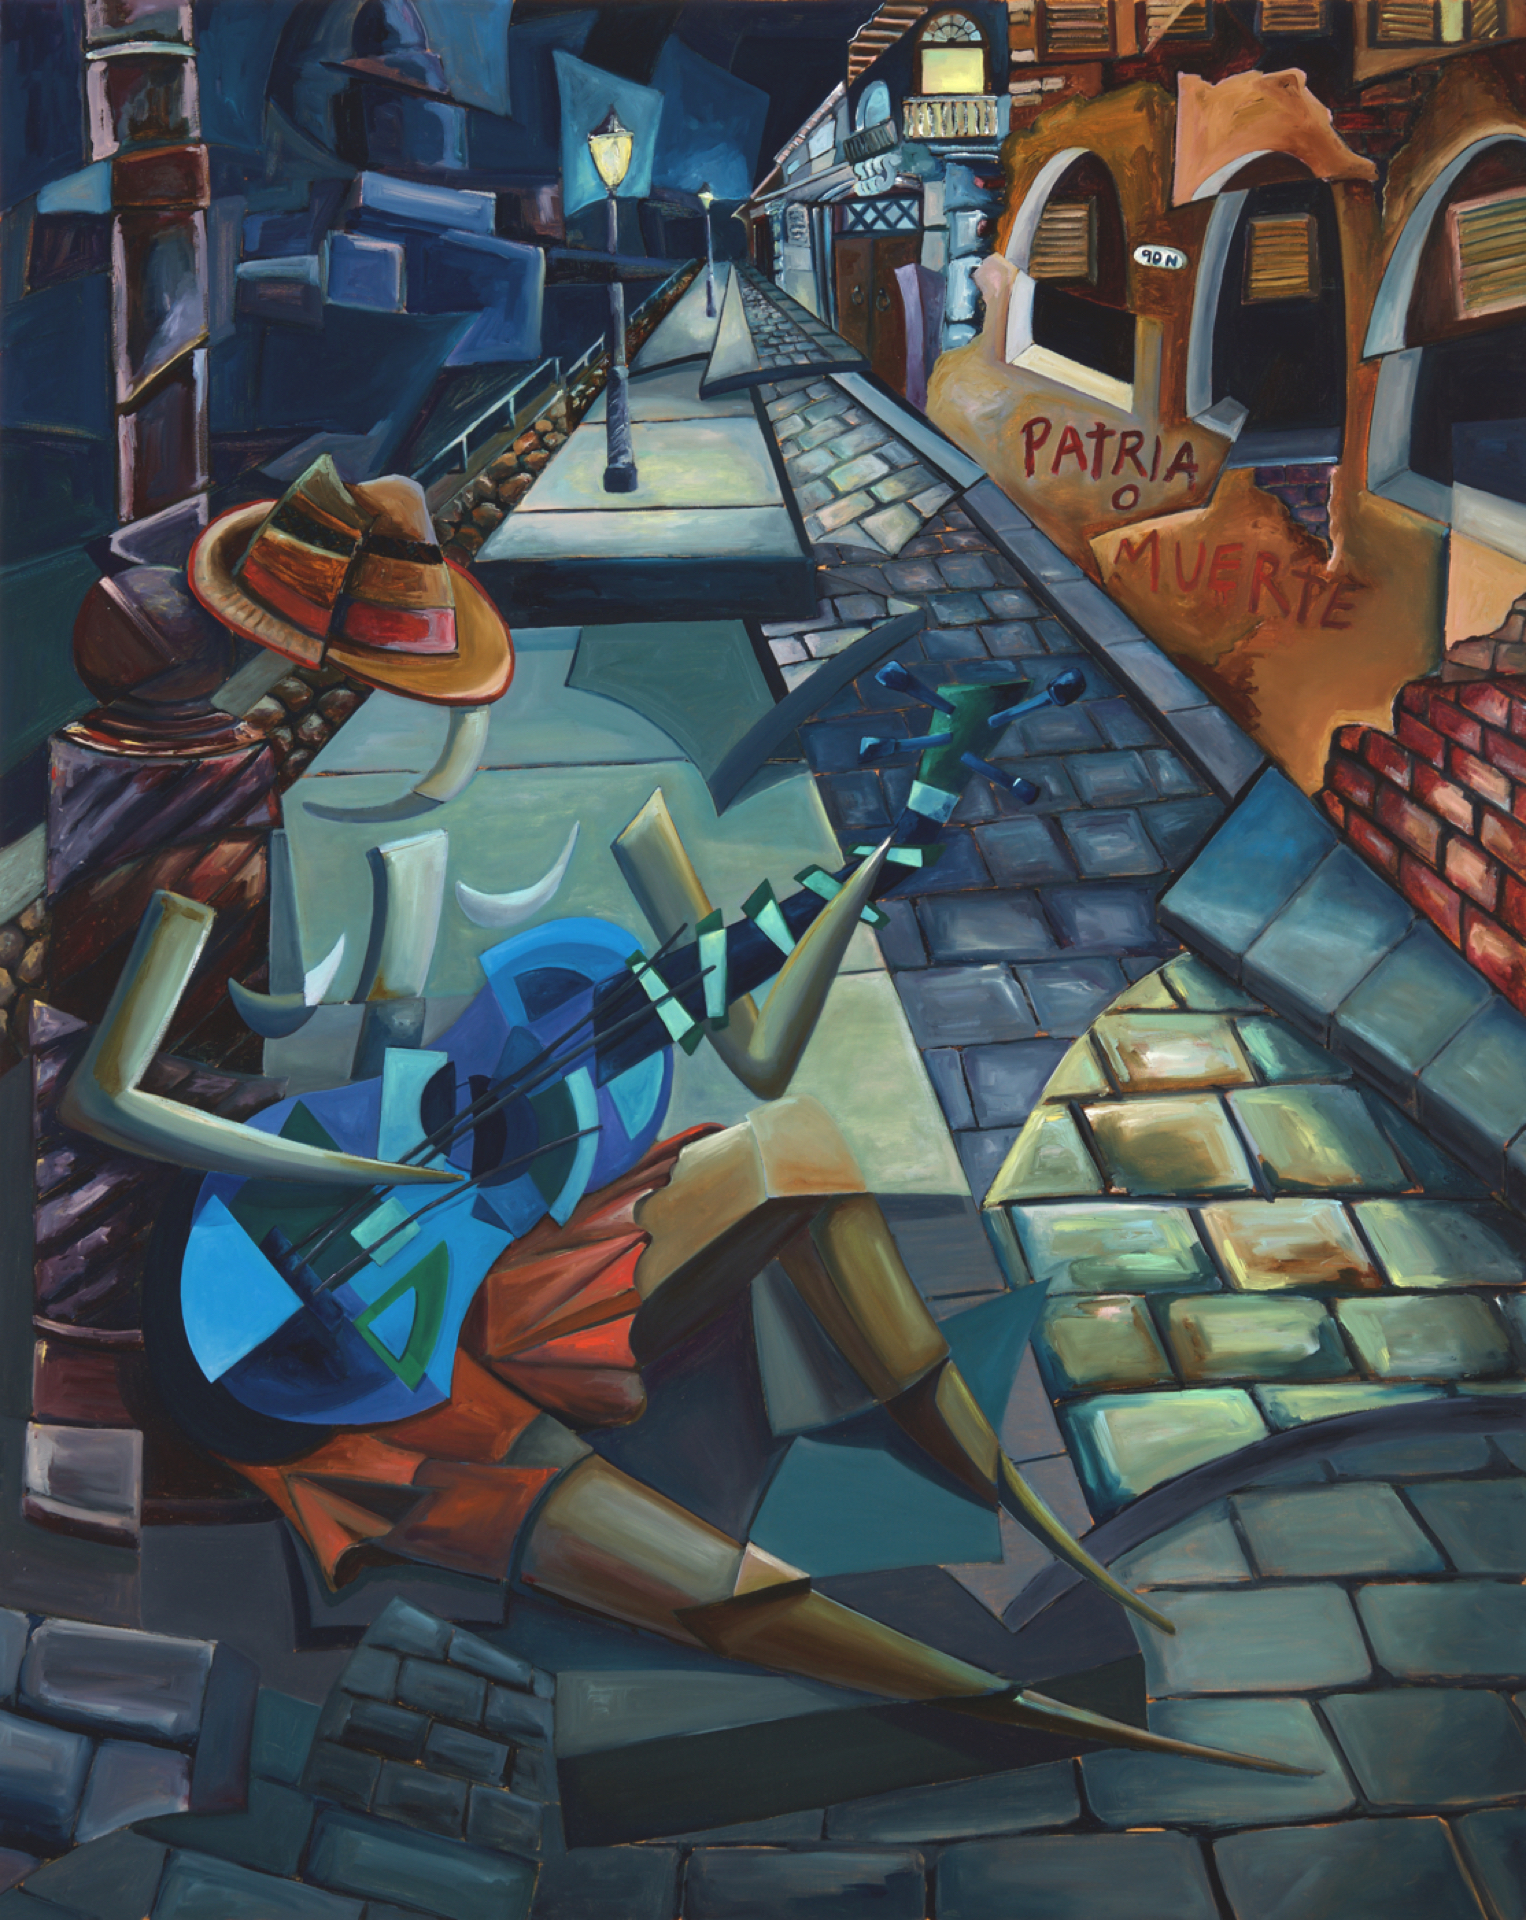 Derwin Leiva_The Blue Guitar_Oil on Canvas_60x 48_20,000 .jpg